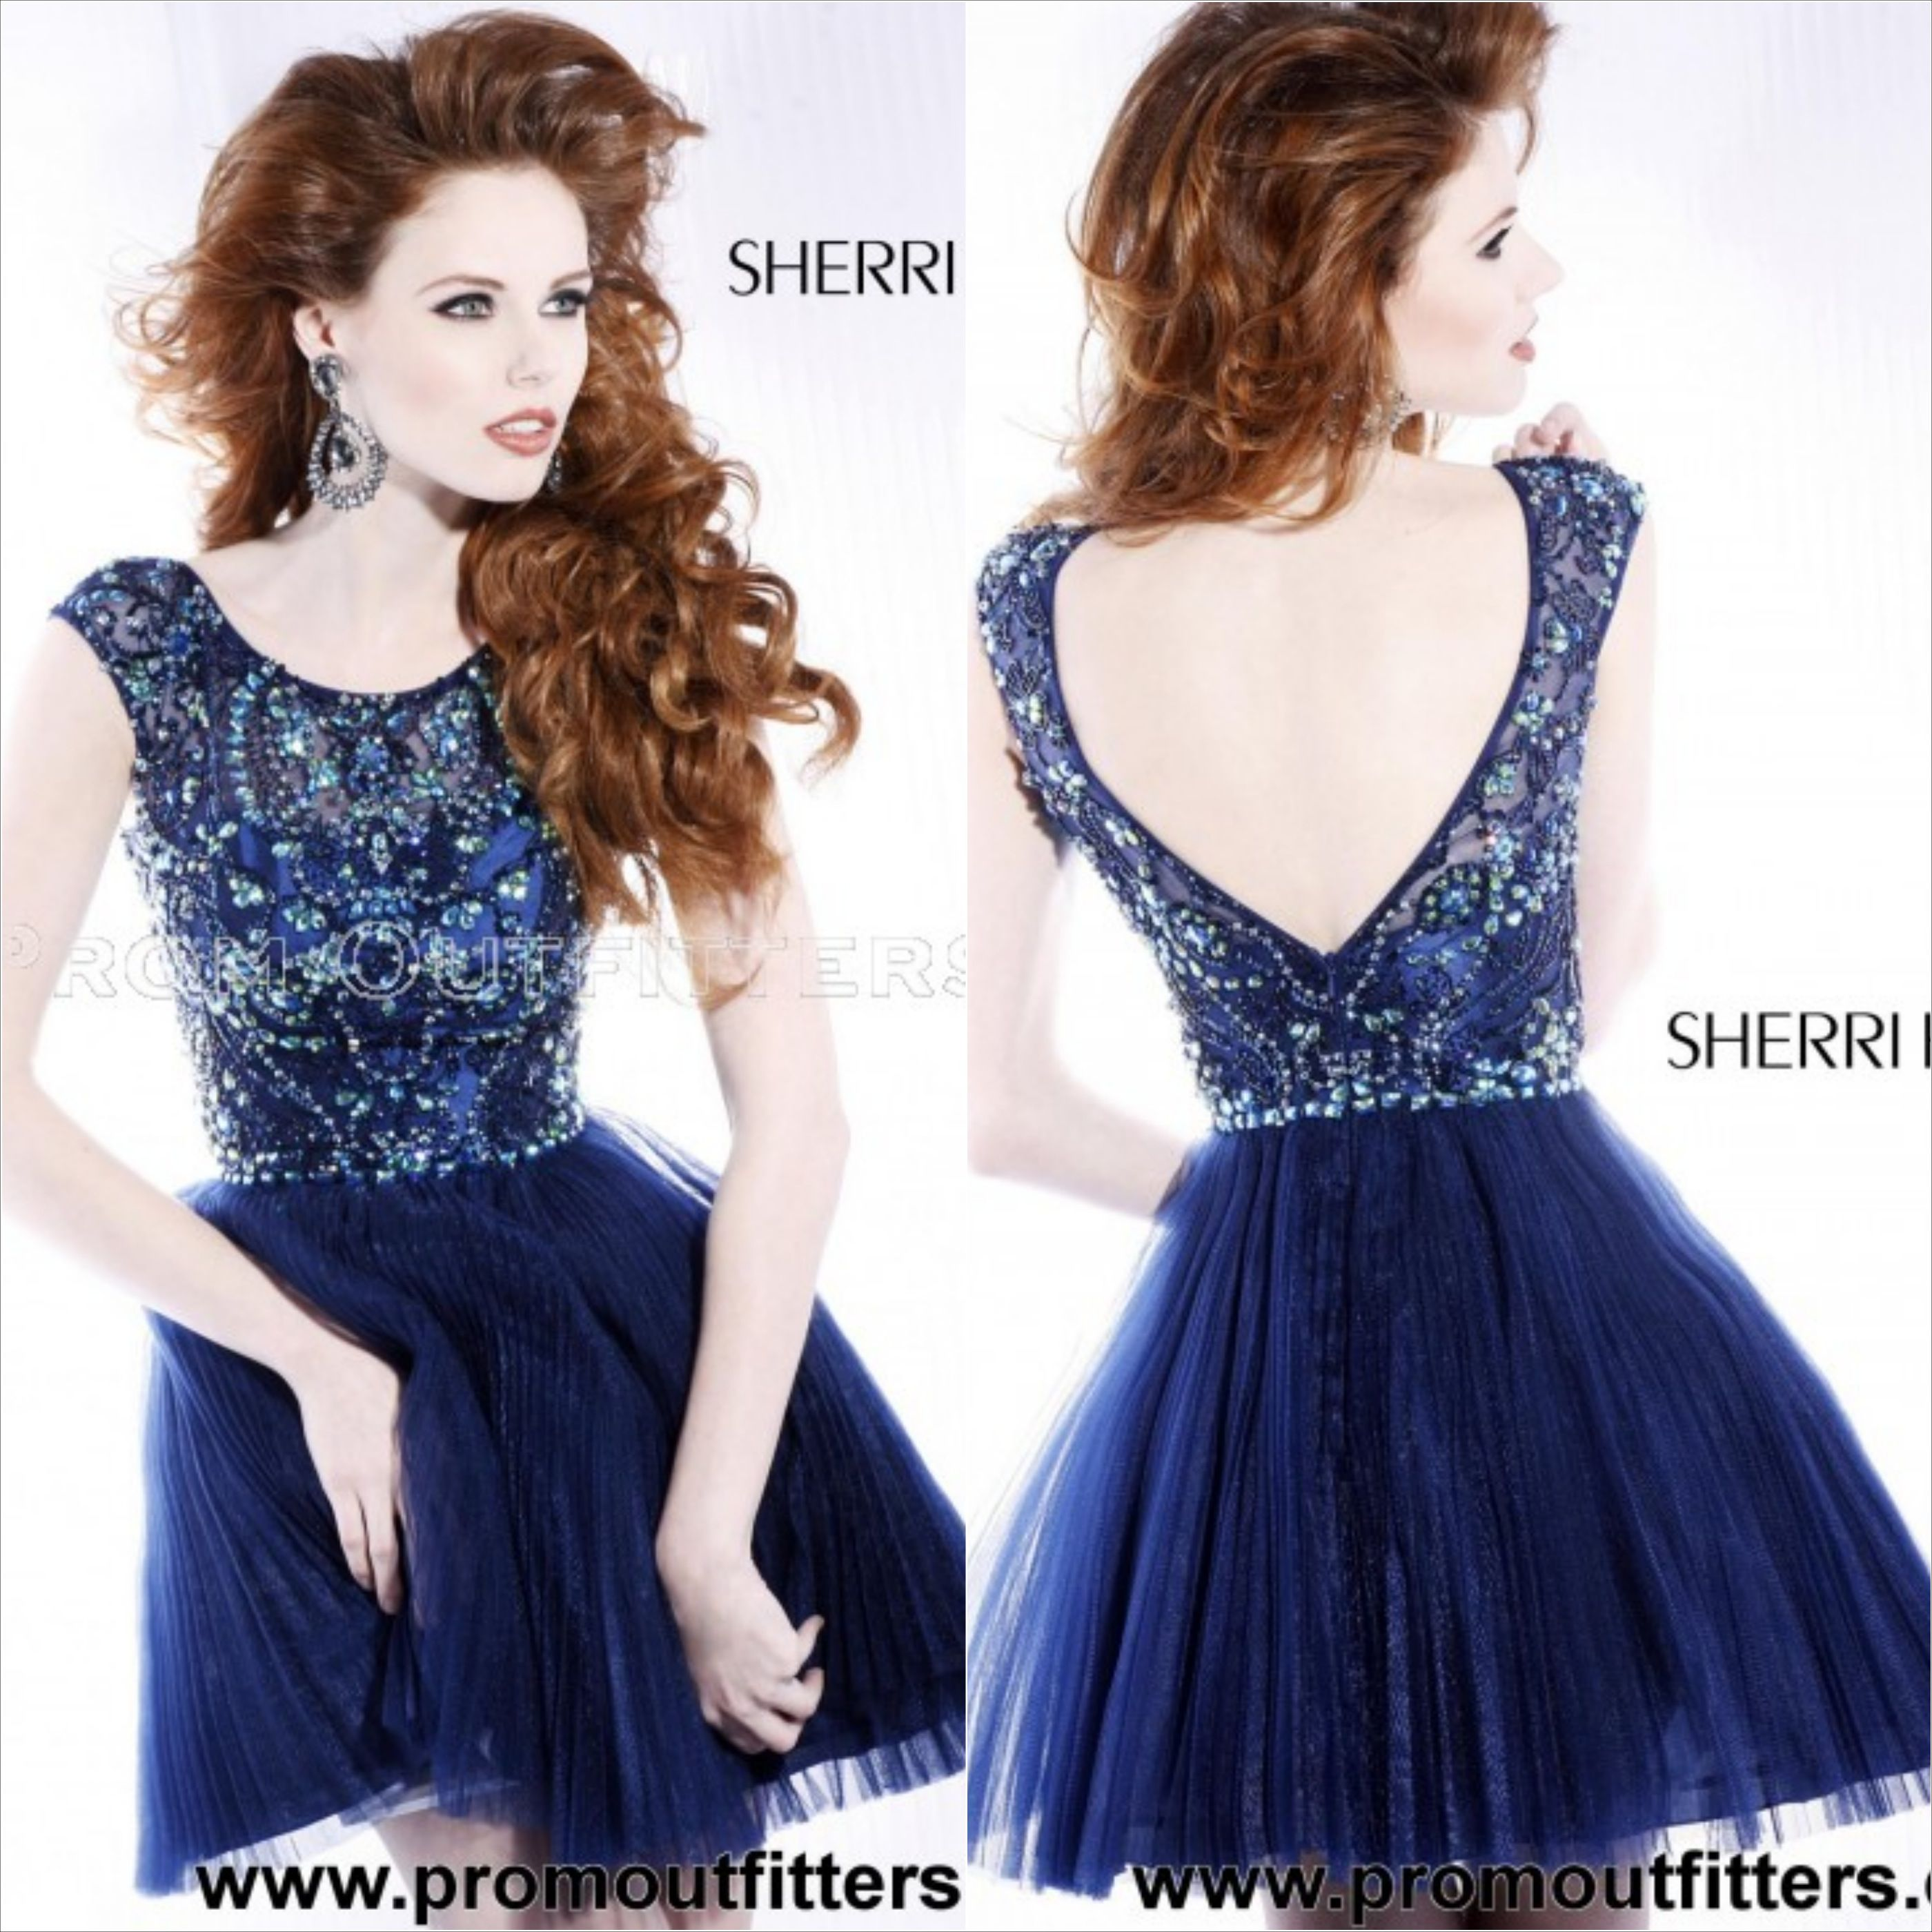 SHERRI HILL 2814 - $450.00 Available colors and sizes Black - 10  Black/Emerald - · Prom Dress 2014Short ...